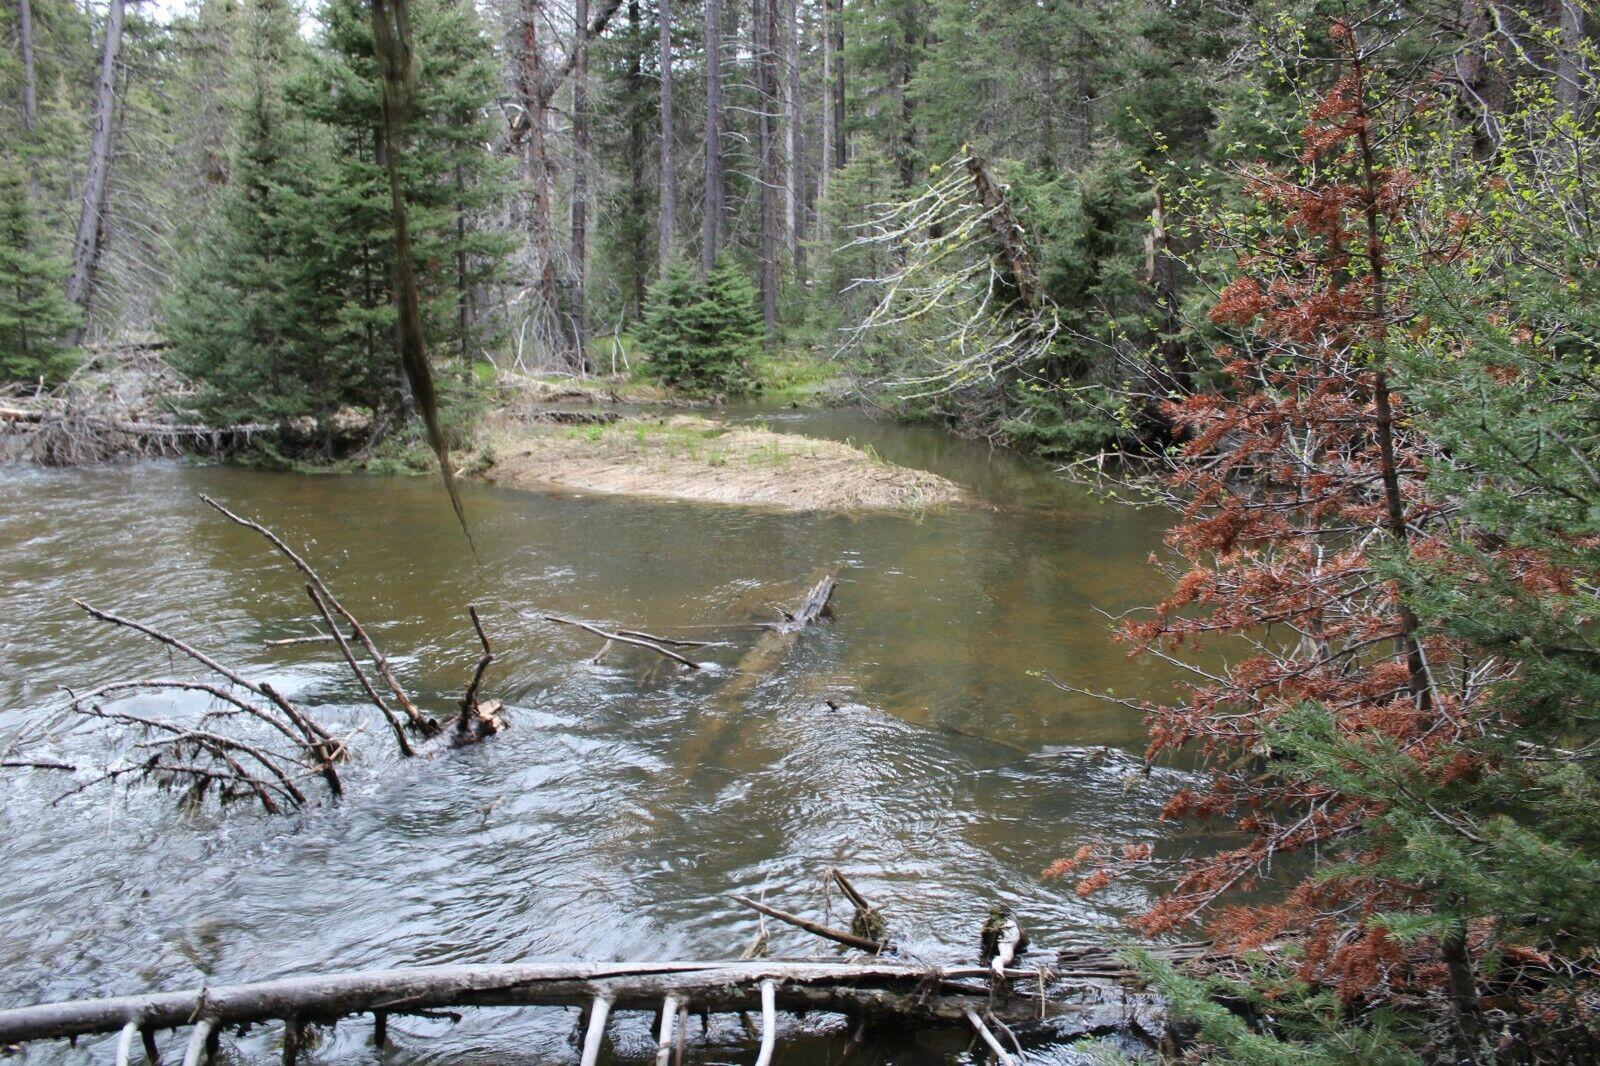 Montana Gold Mine Placer Creek Mining Claim Panning Sluice Highbank Snipe Detect - $402.88